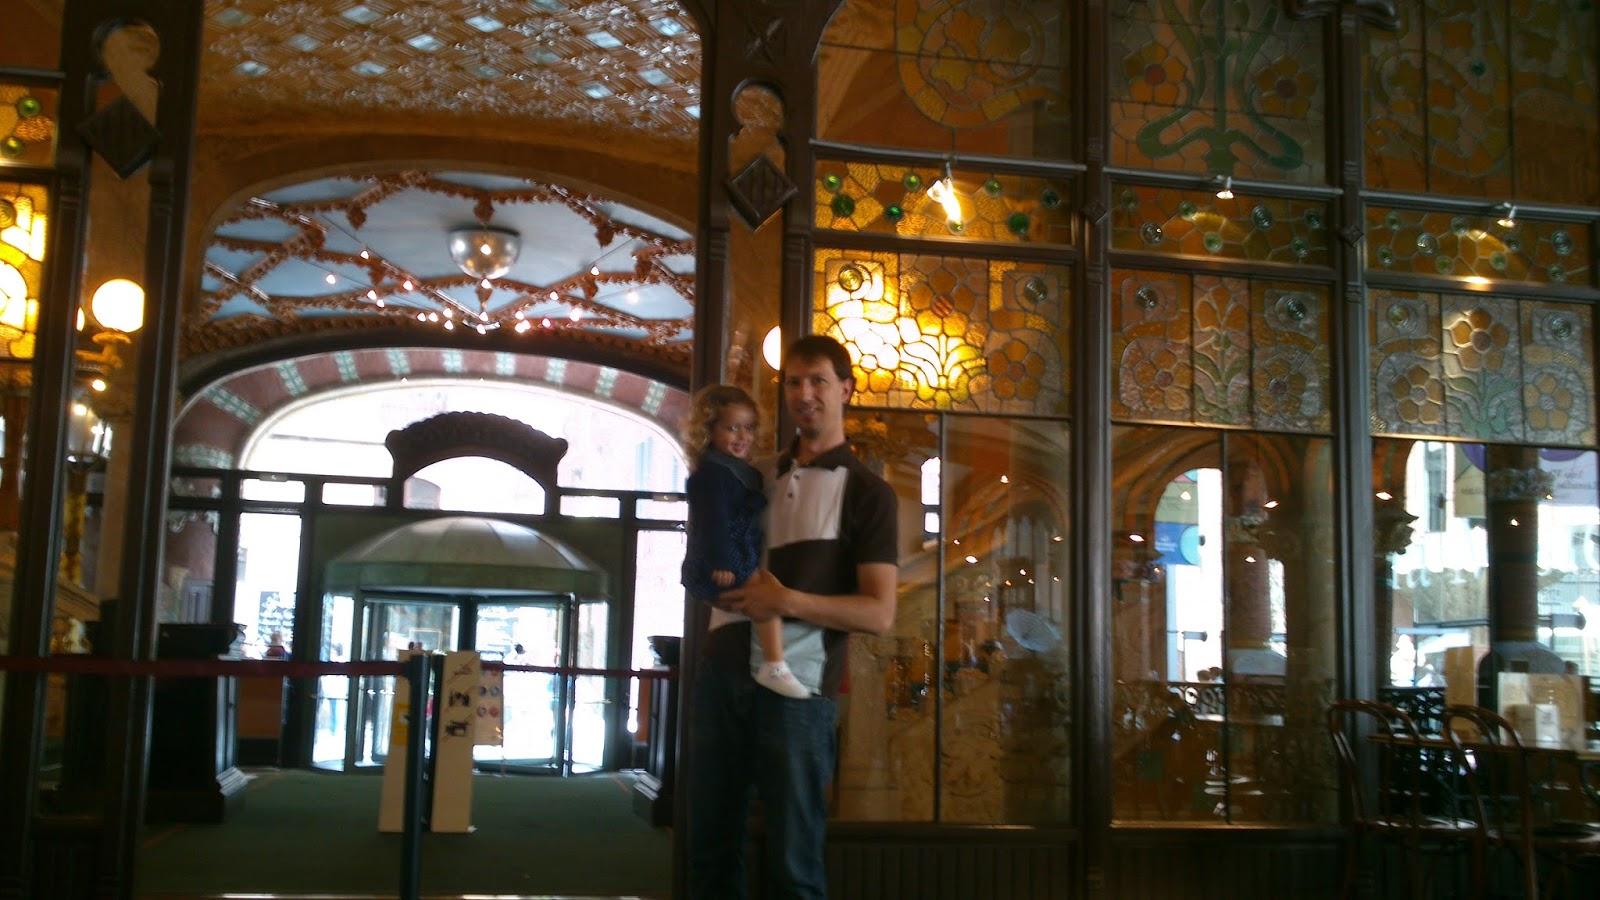 interior Palau de la música de Barcelona